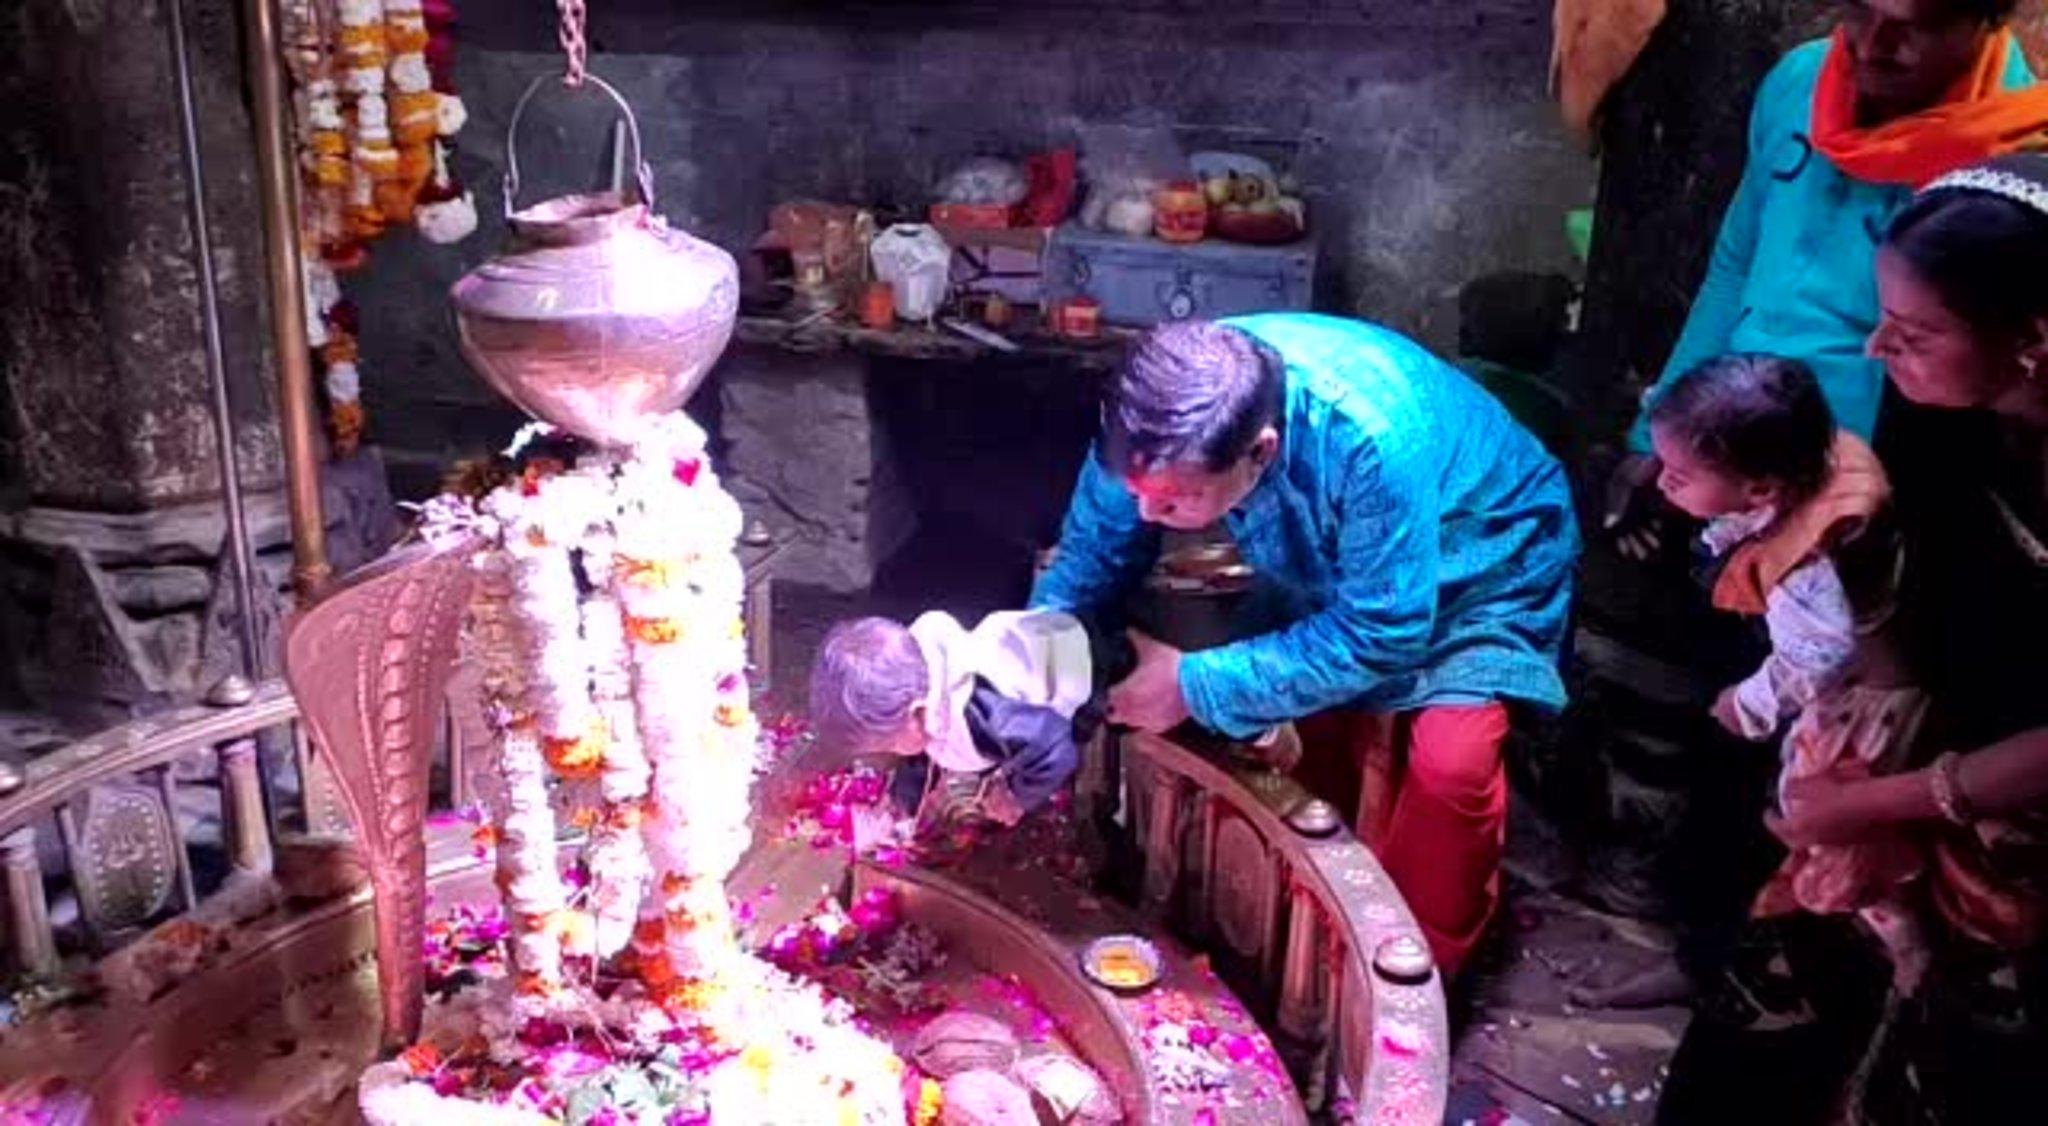 PunjabKesari,Virupaksha Temple Bilpank, विरुपाक्ष महादेव मंदिर, Virupaksha Temple Madhya pradesh, Shiv Temple, Virupaksha Mahadev Temple, Dharmik Sthal, Religious Place In India, Hindu Tirth Sthal, हिन्दू धार्मिक स्थल, भारत के प्रसिद्ध मंदिर